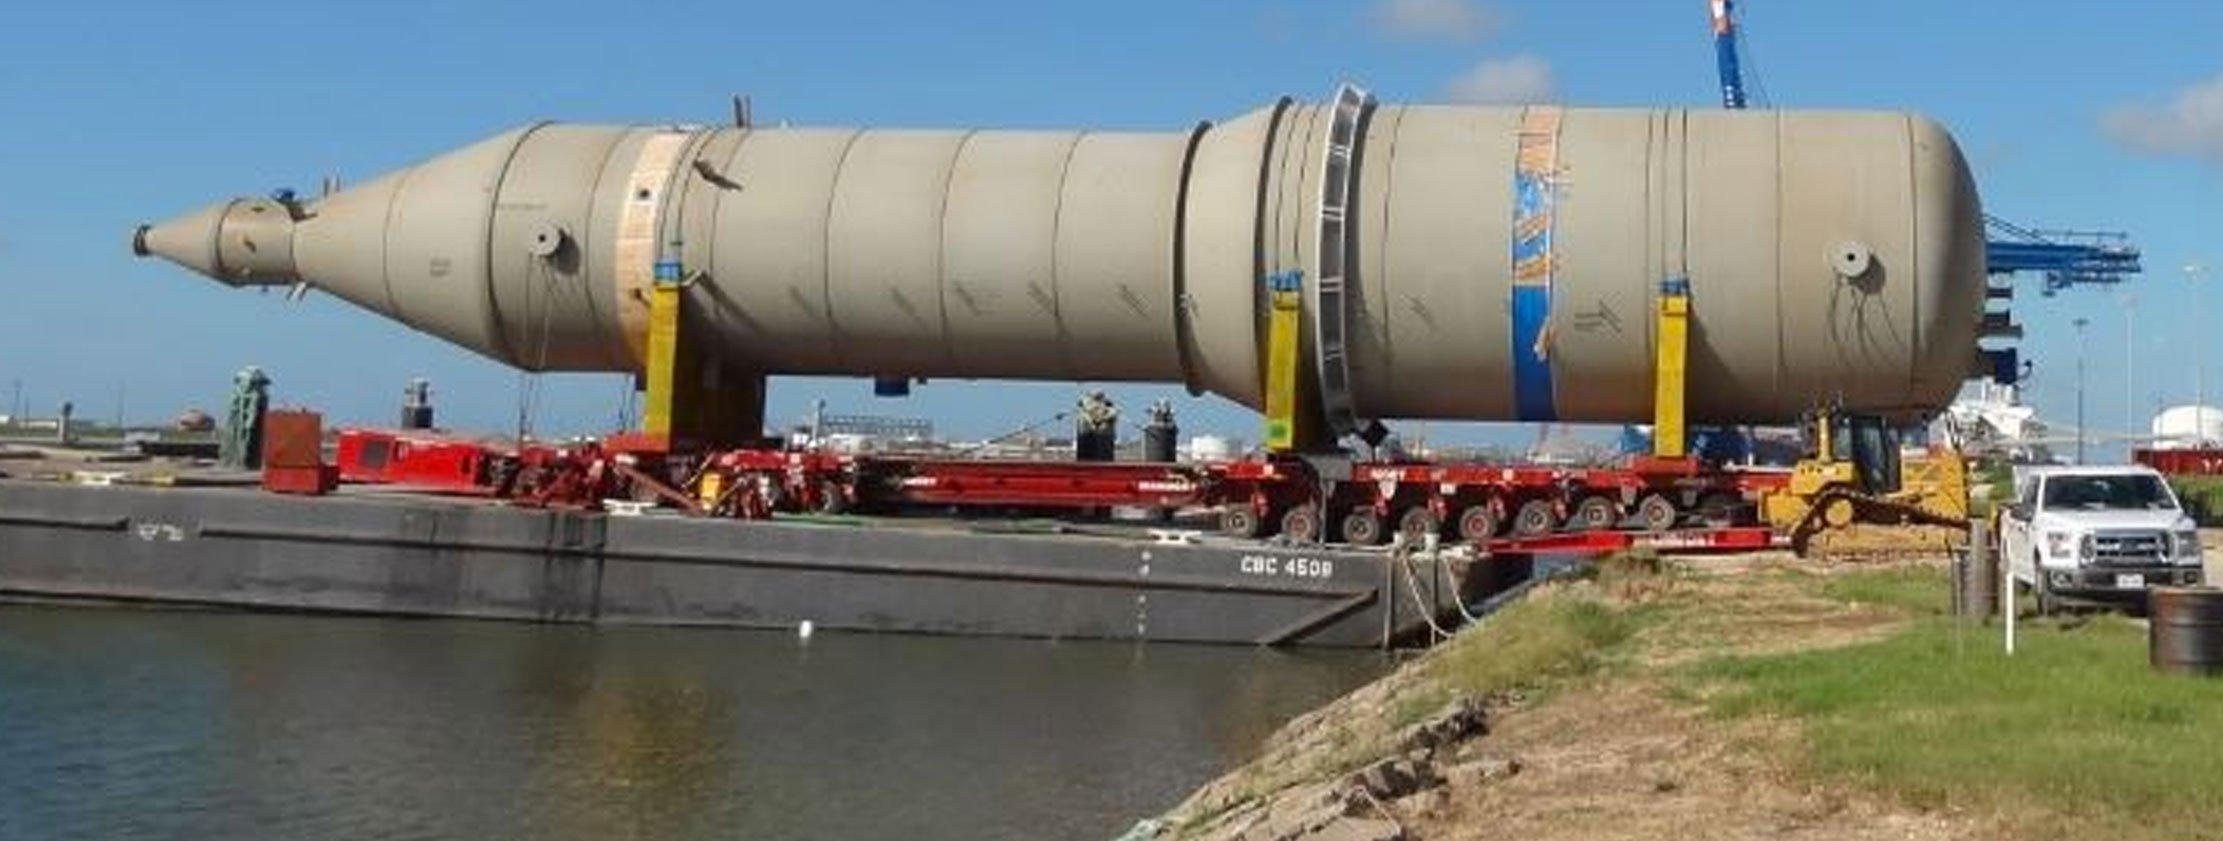 project cargo gulf coast